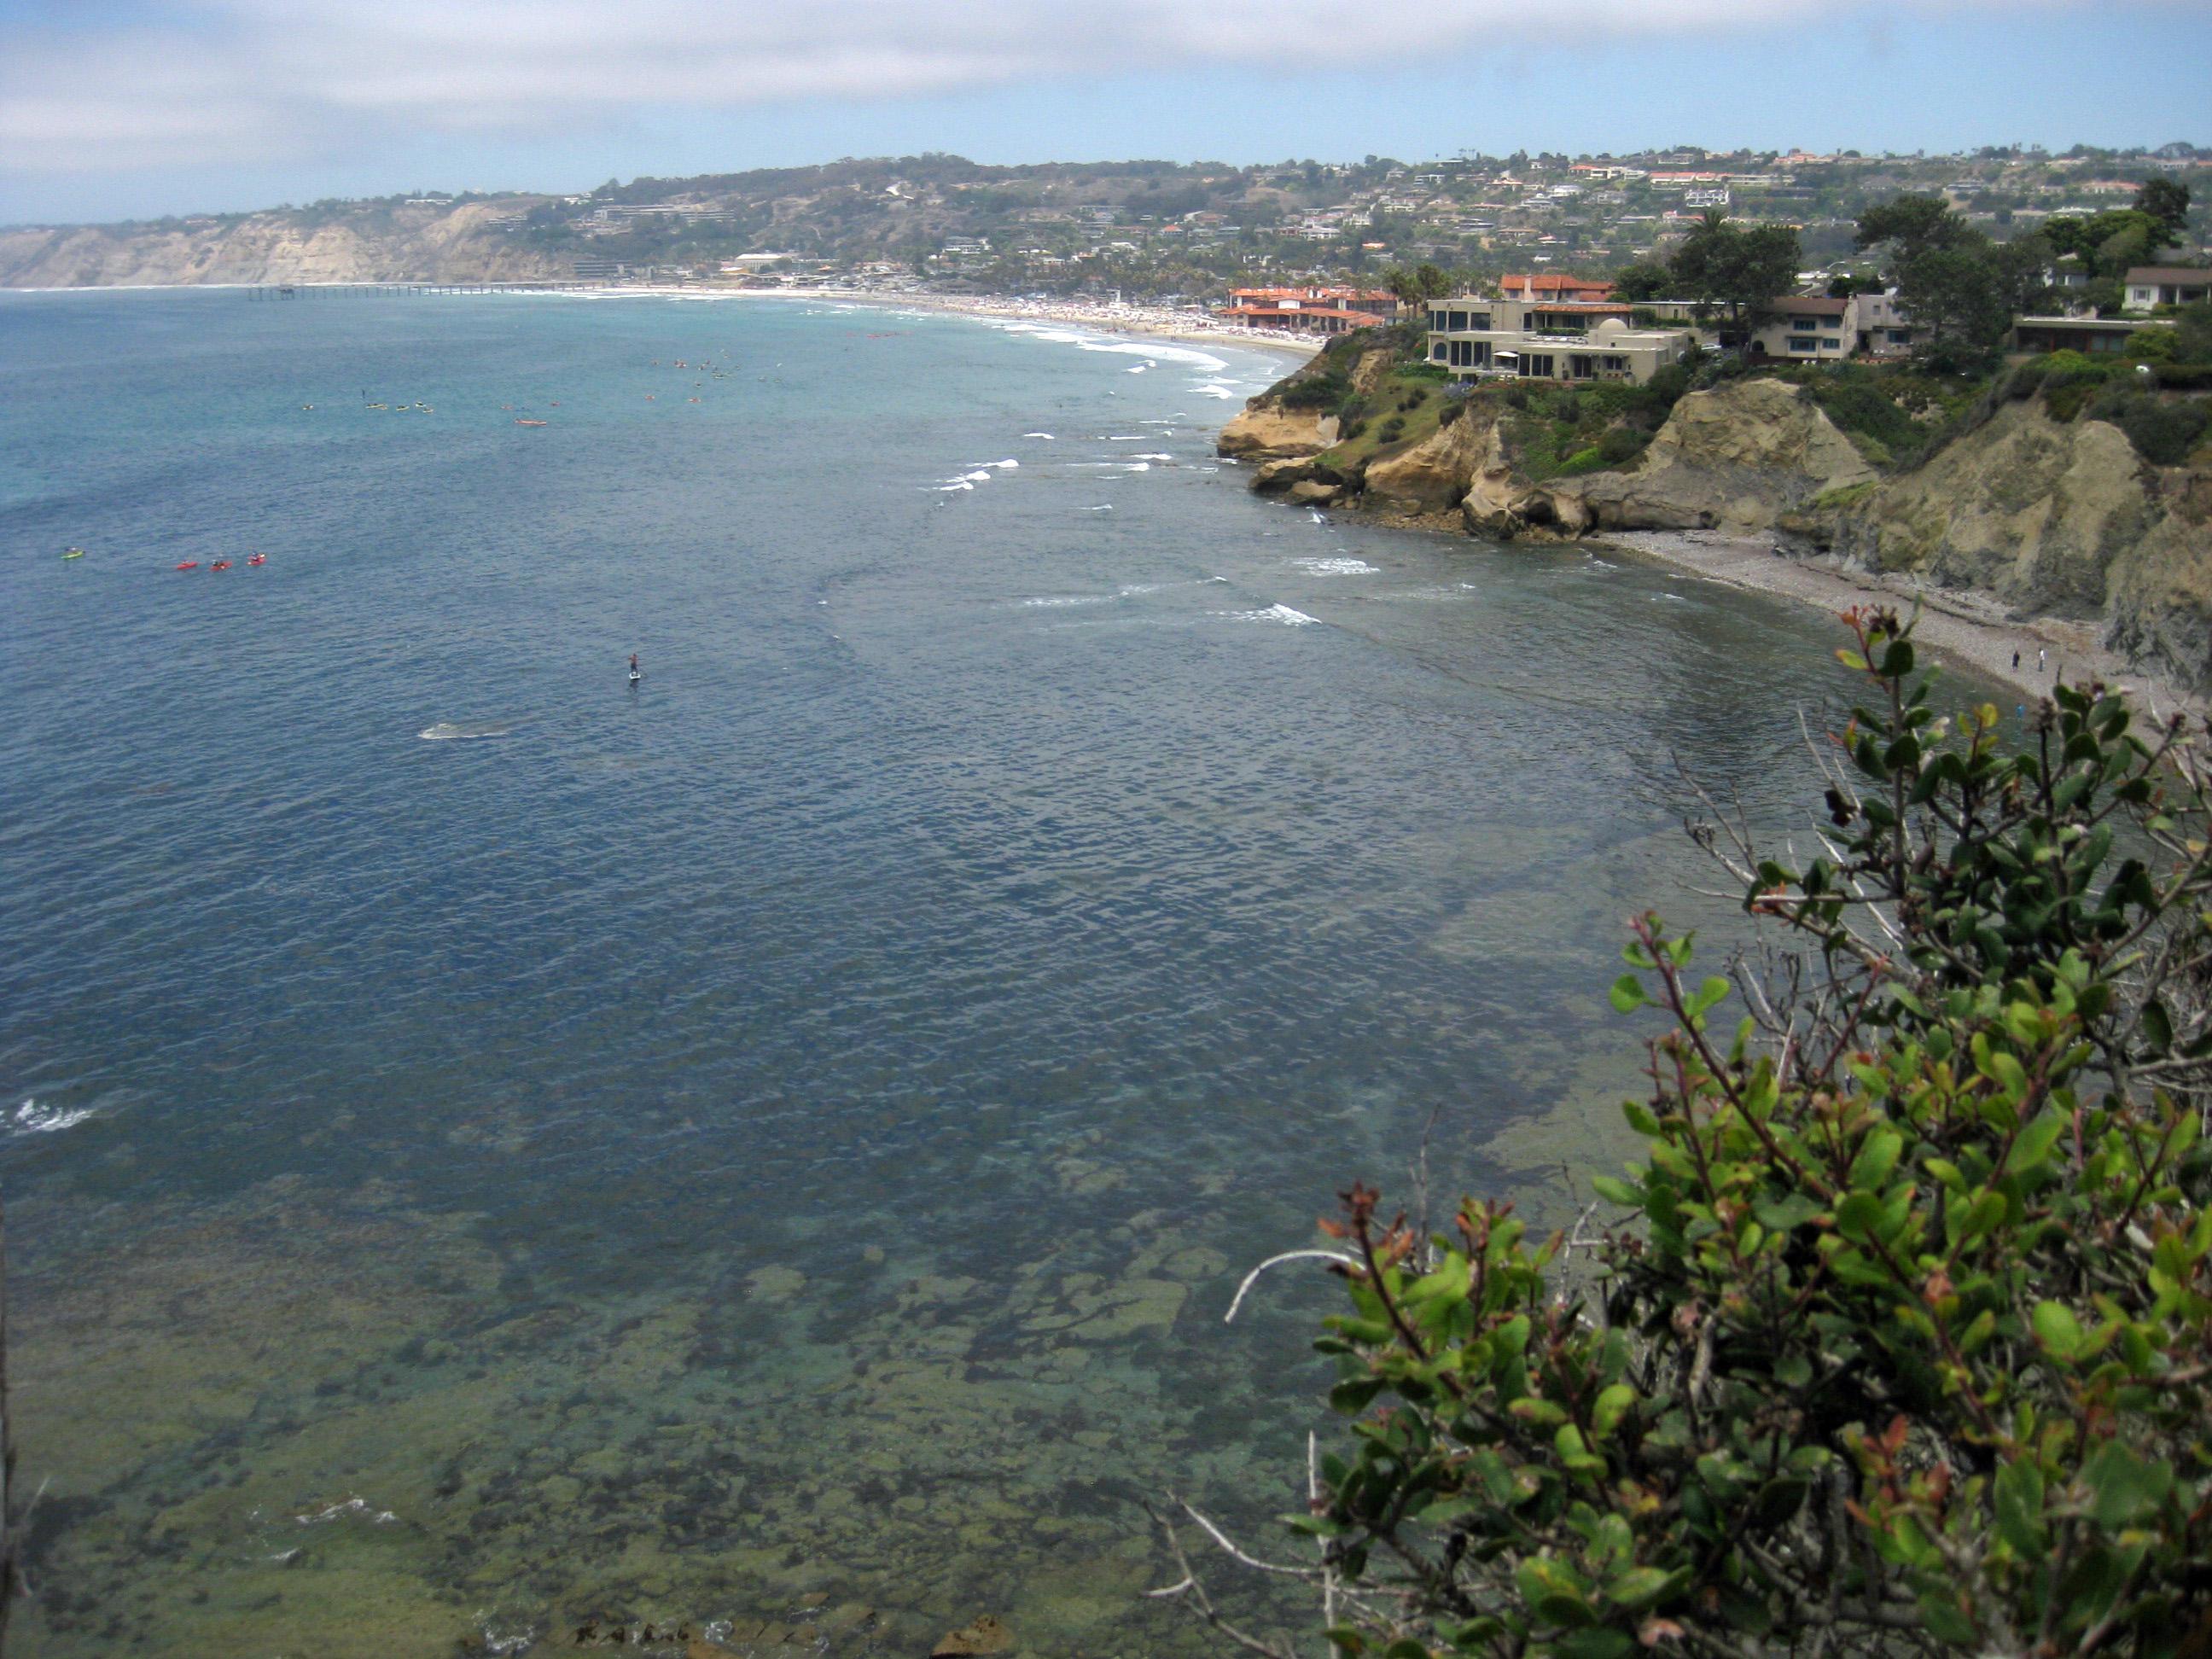 California | Trench Coat Travels